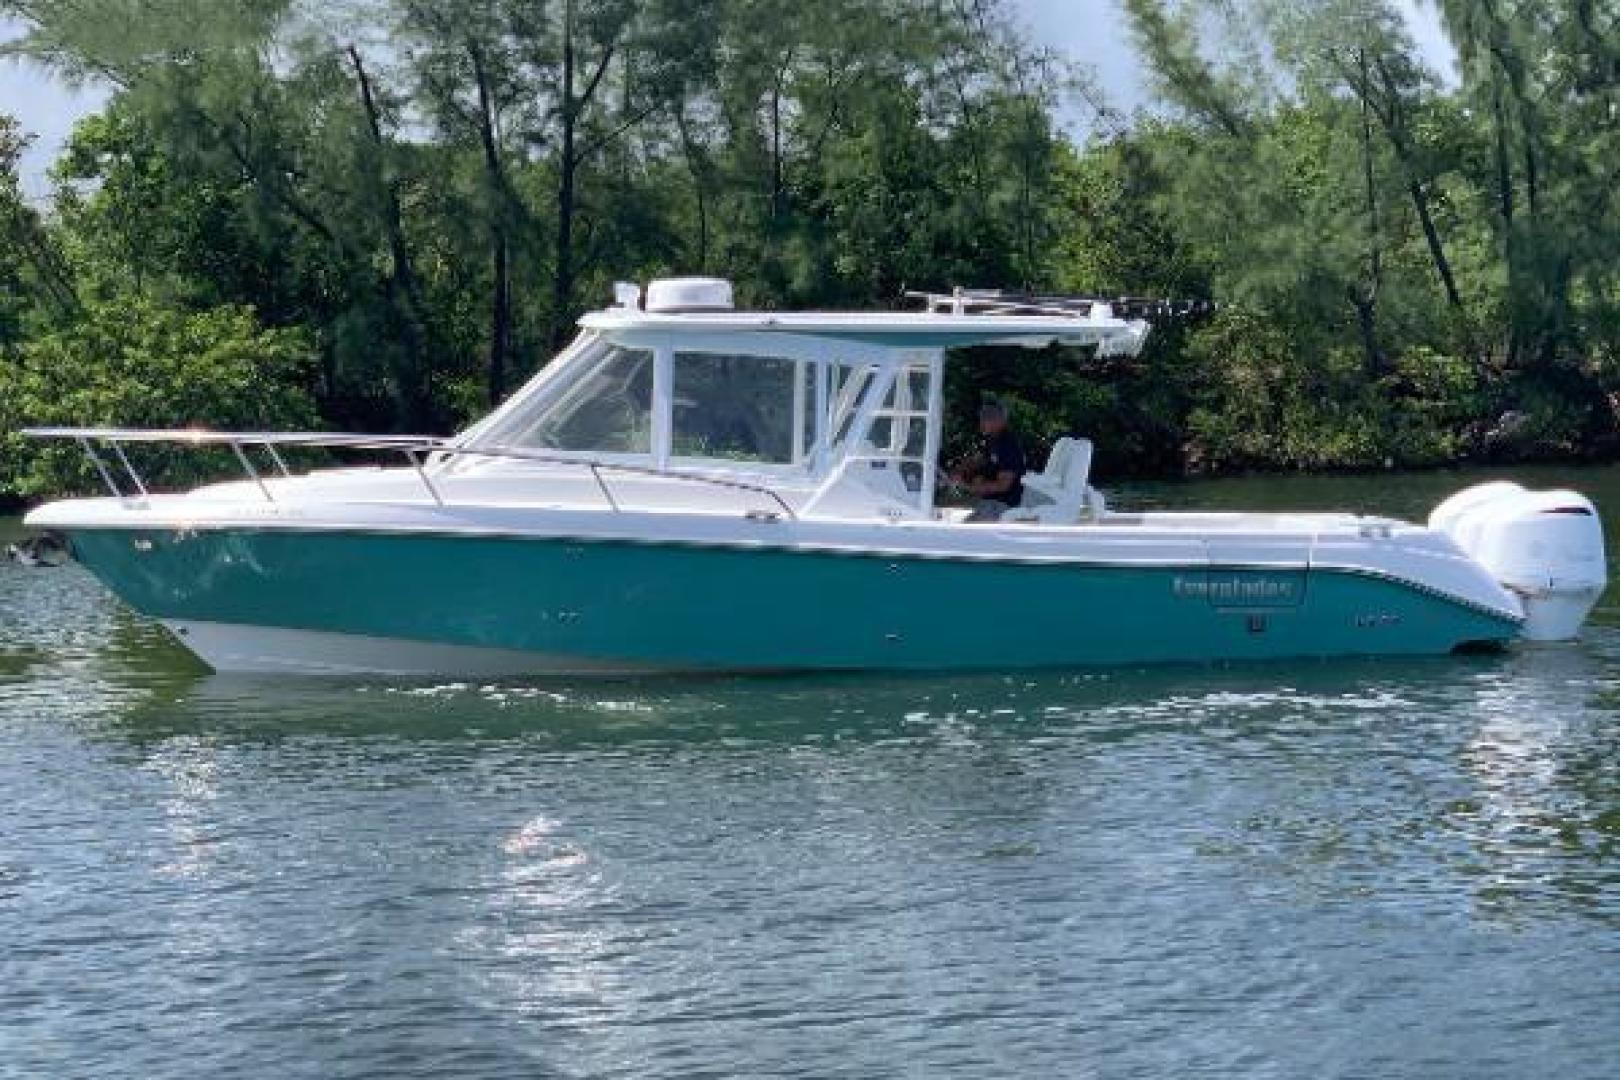 Everglades-350LX 2016-Everglades 350LX Fort Lauderdale-Florida-United States-1530947 | Thumbnail